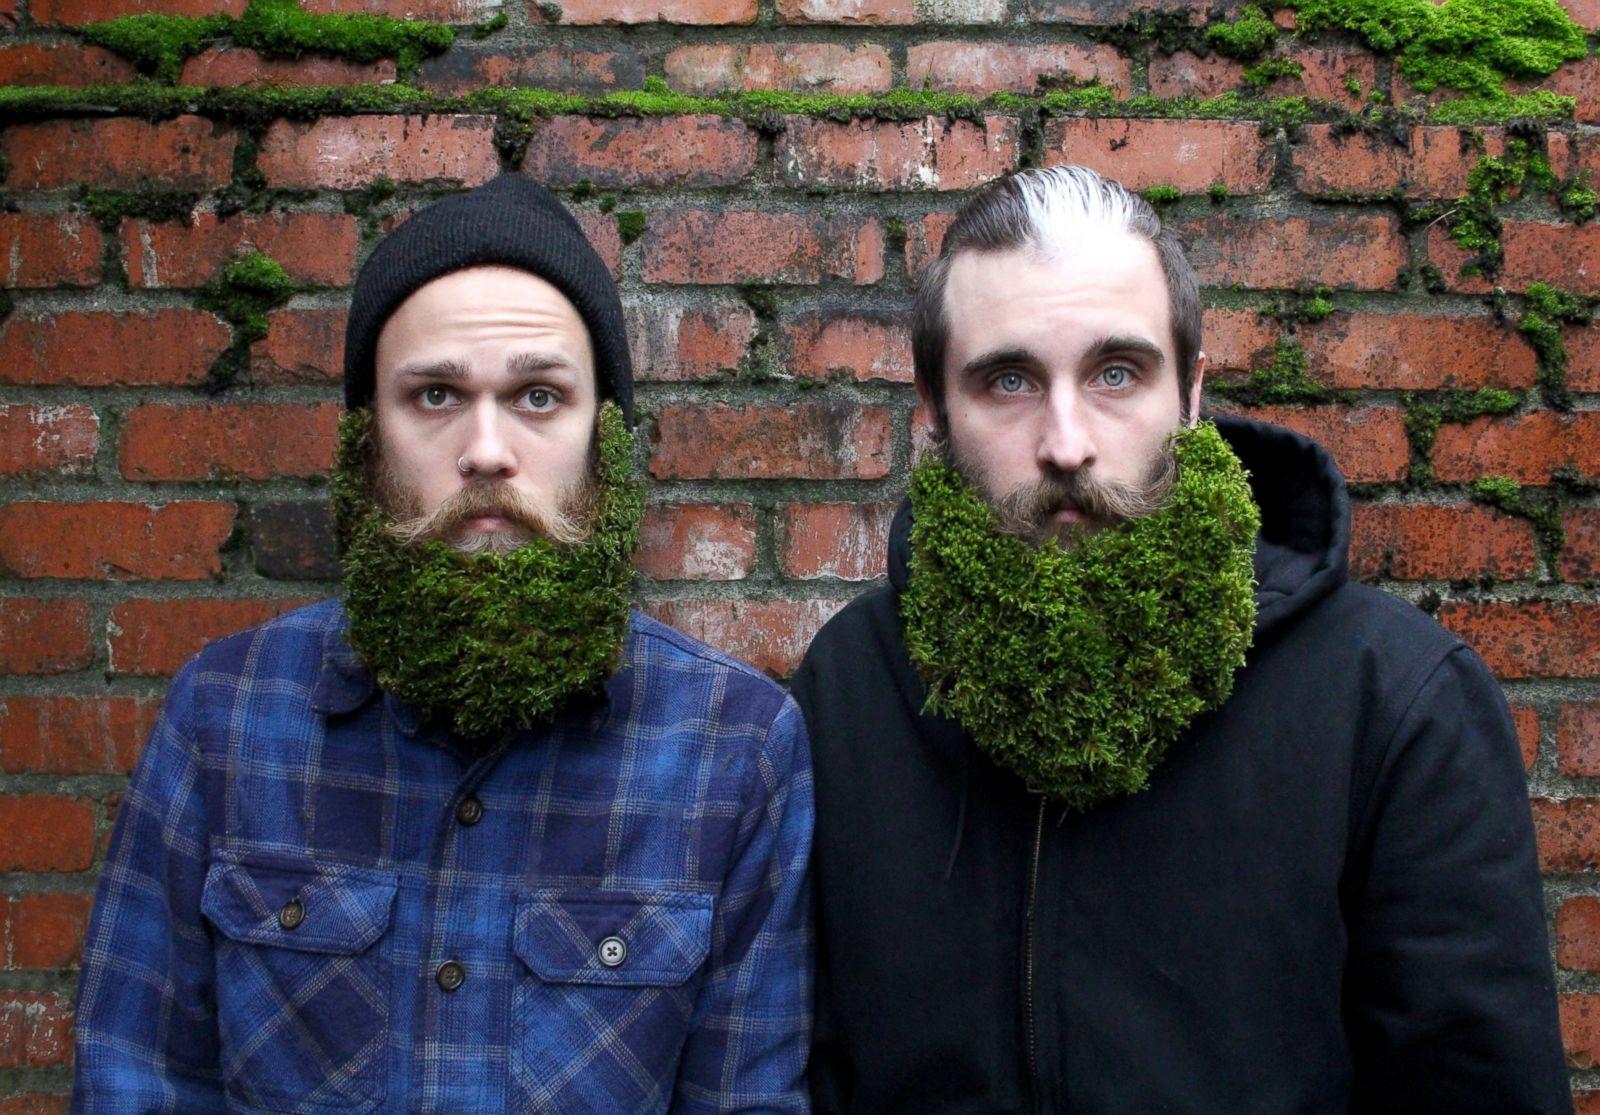 extreme beard grooming photos image 2 abc news. Black Bedroom Furniture Sets. Home Design Ideas